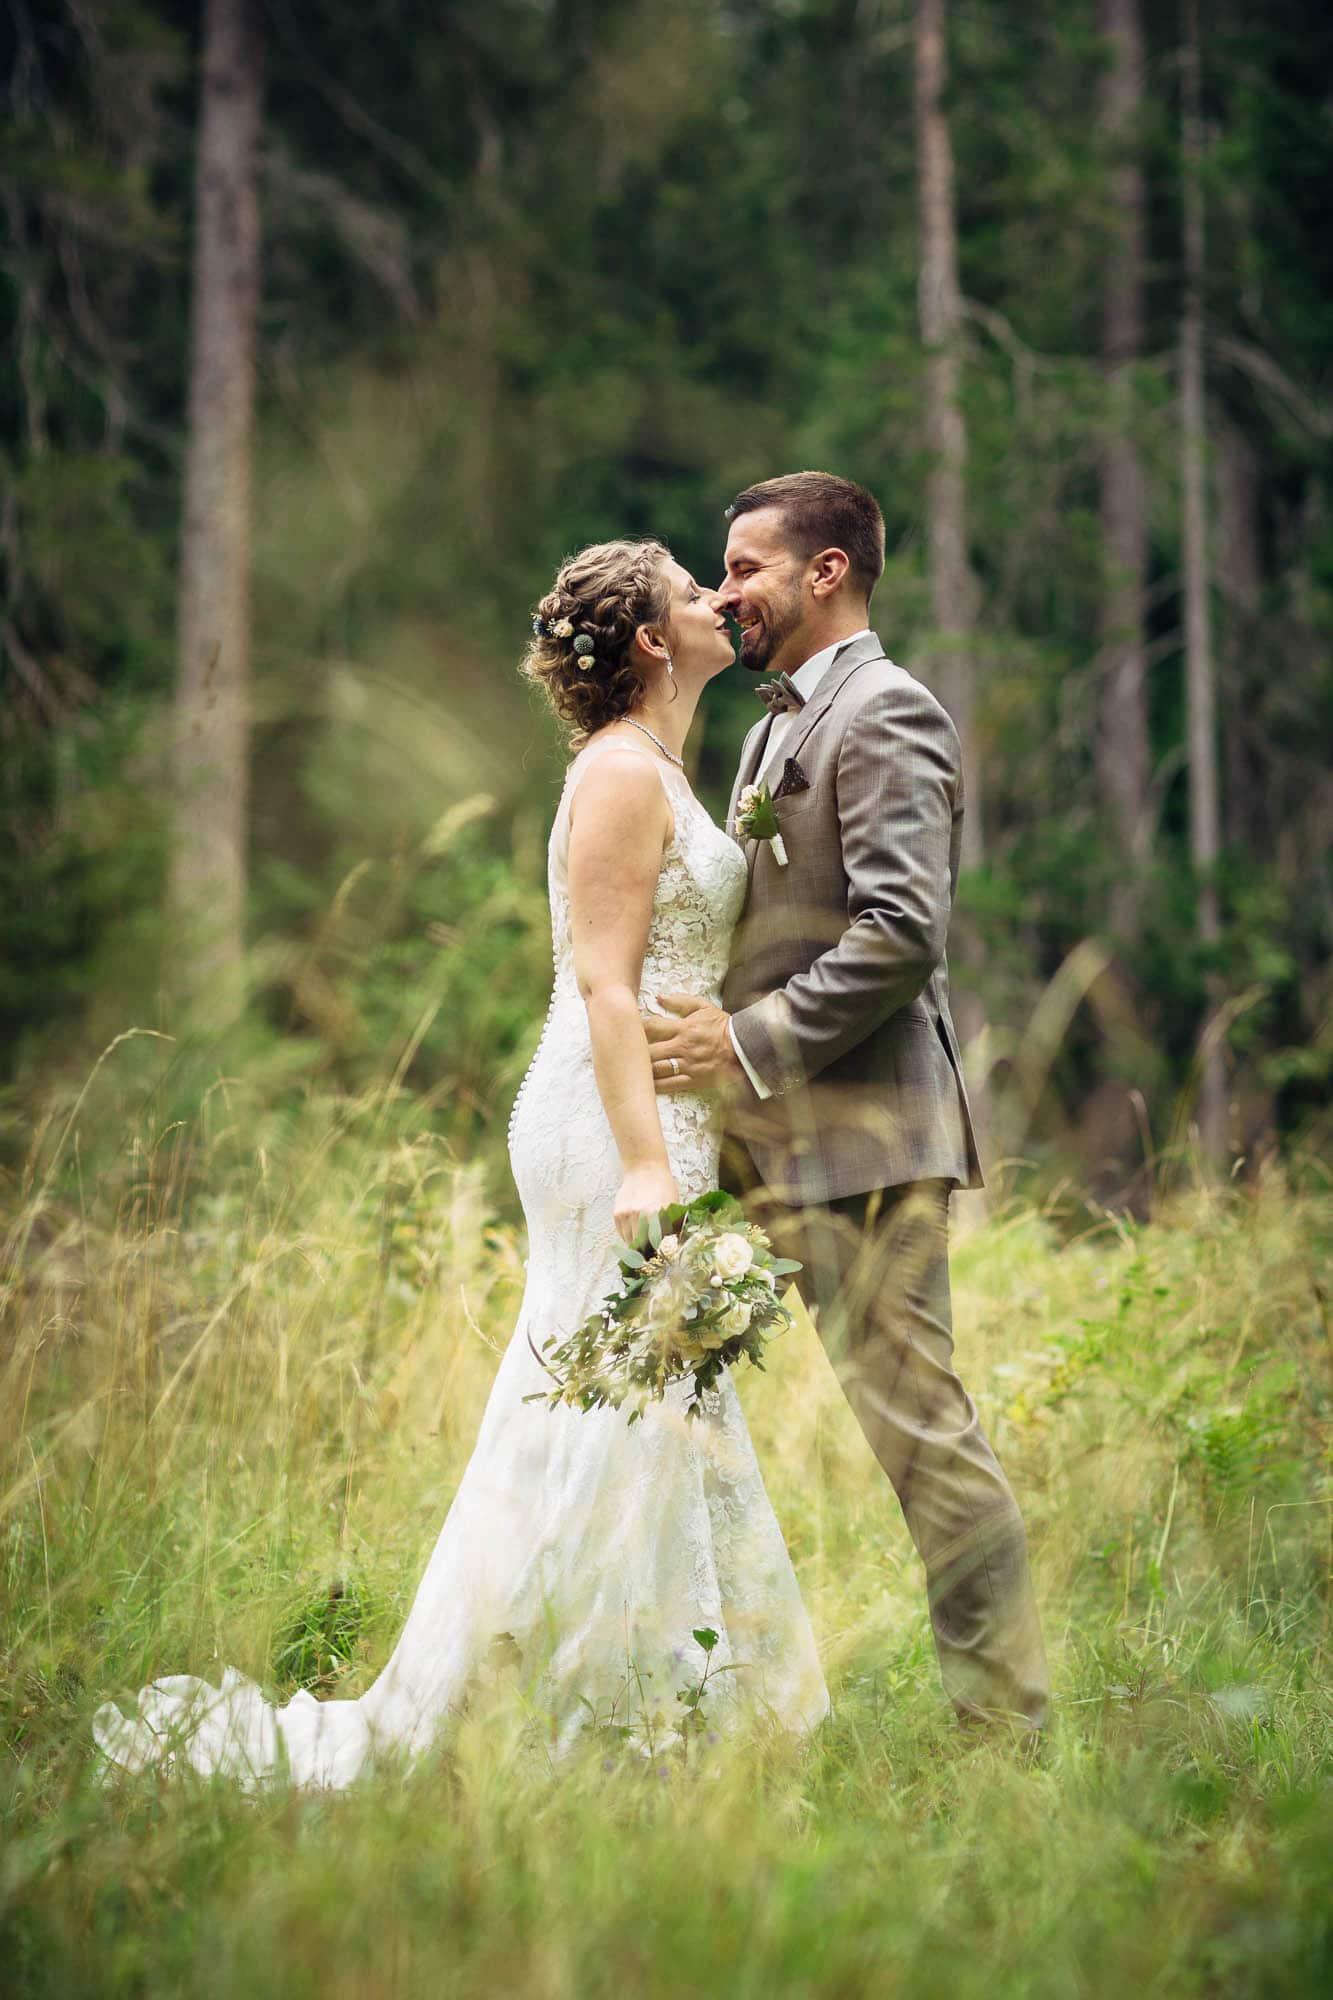 Brautpaarfotos im Wald Laax